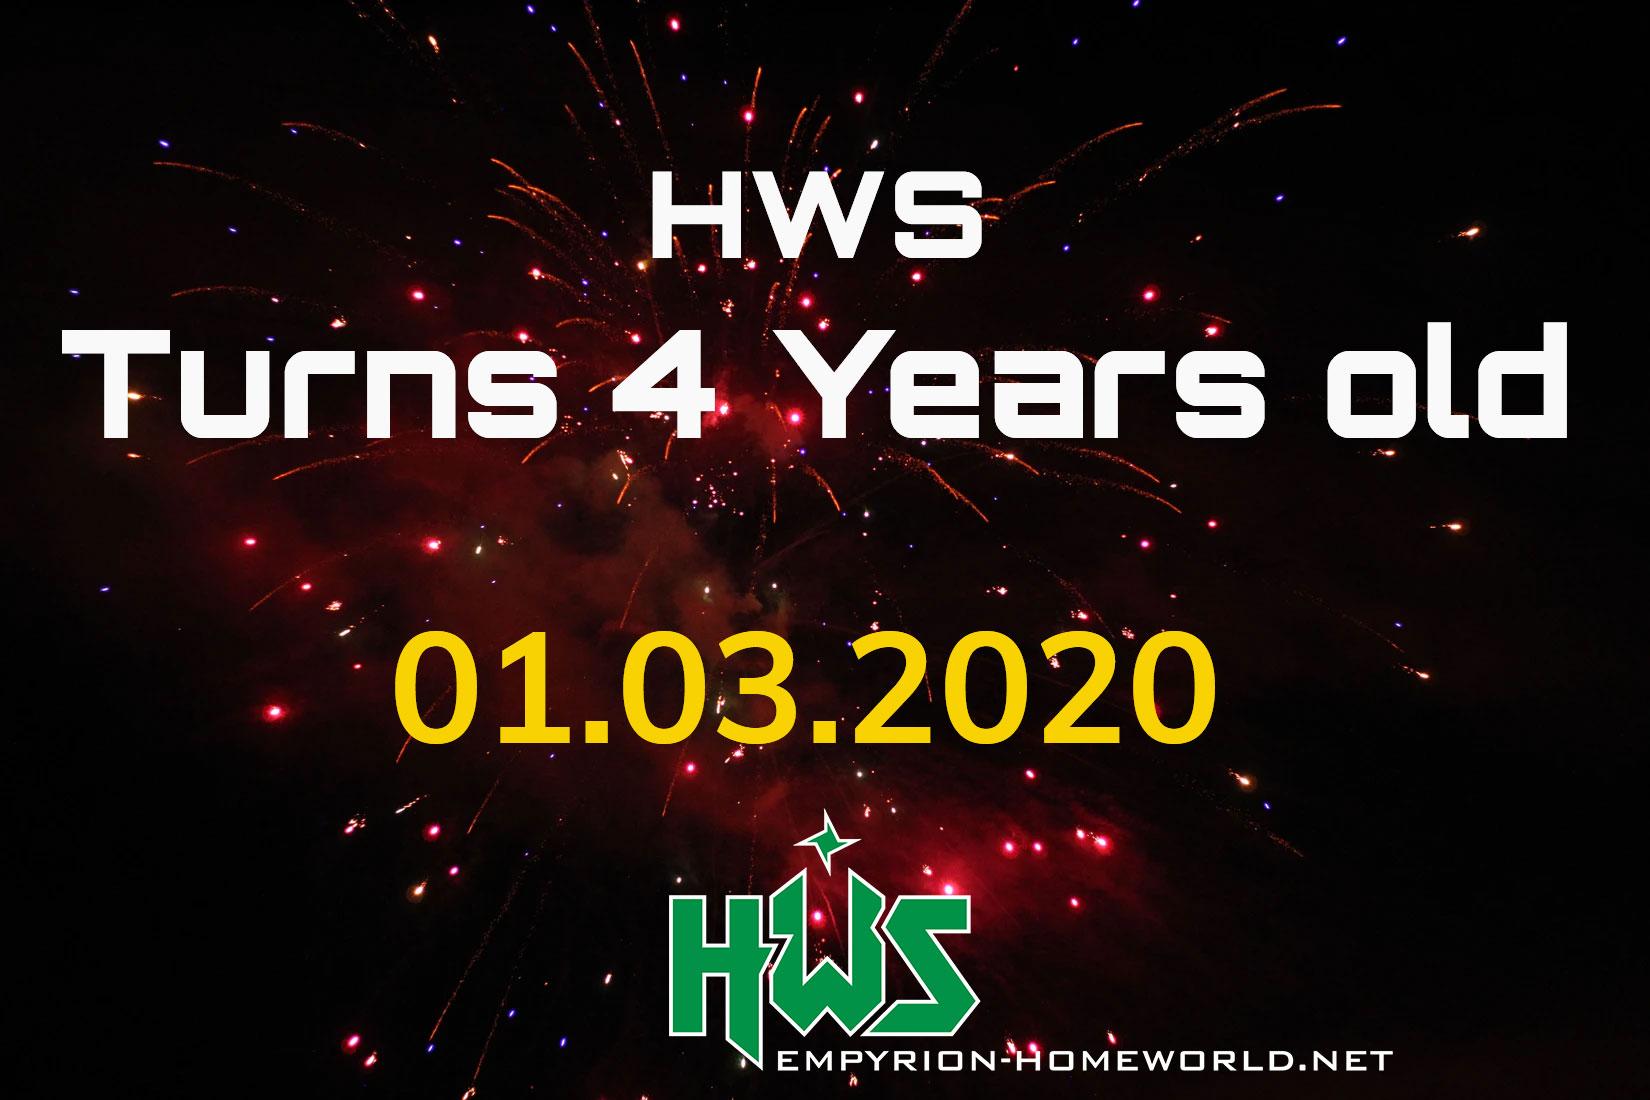 hws-birthday-4